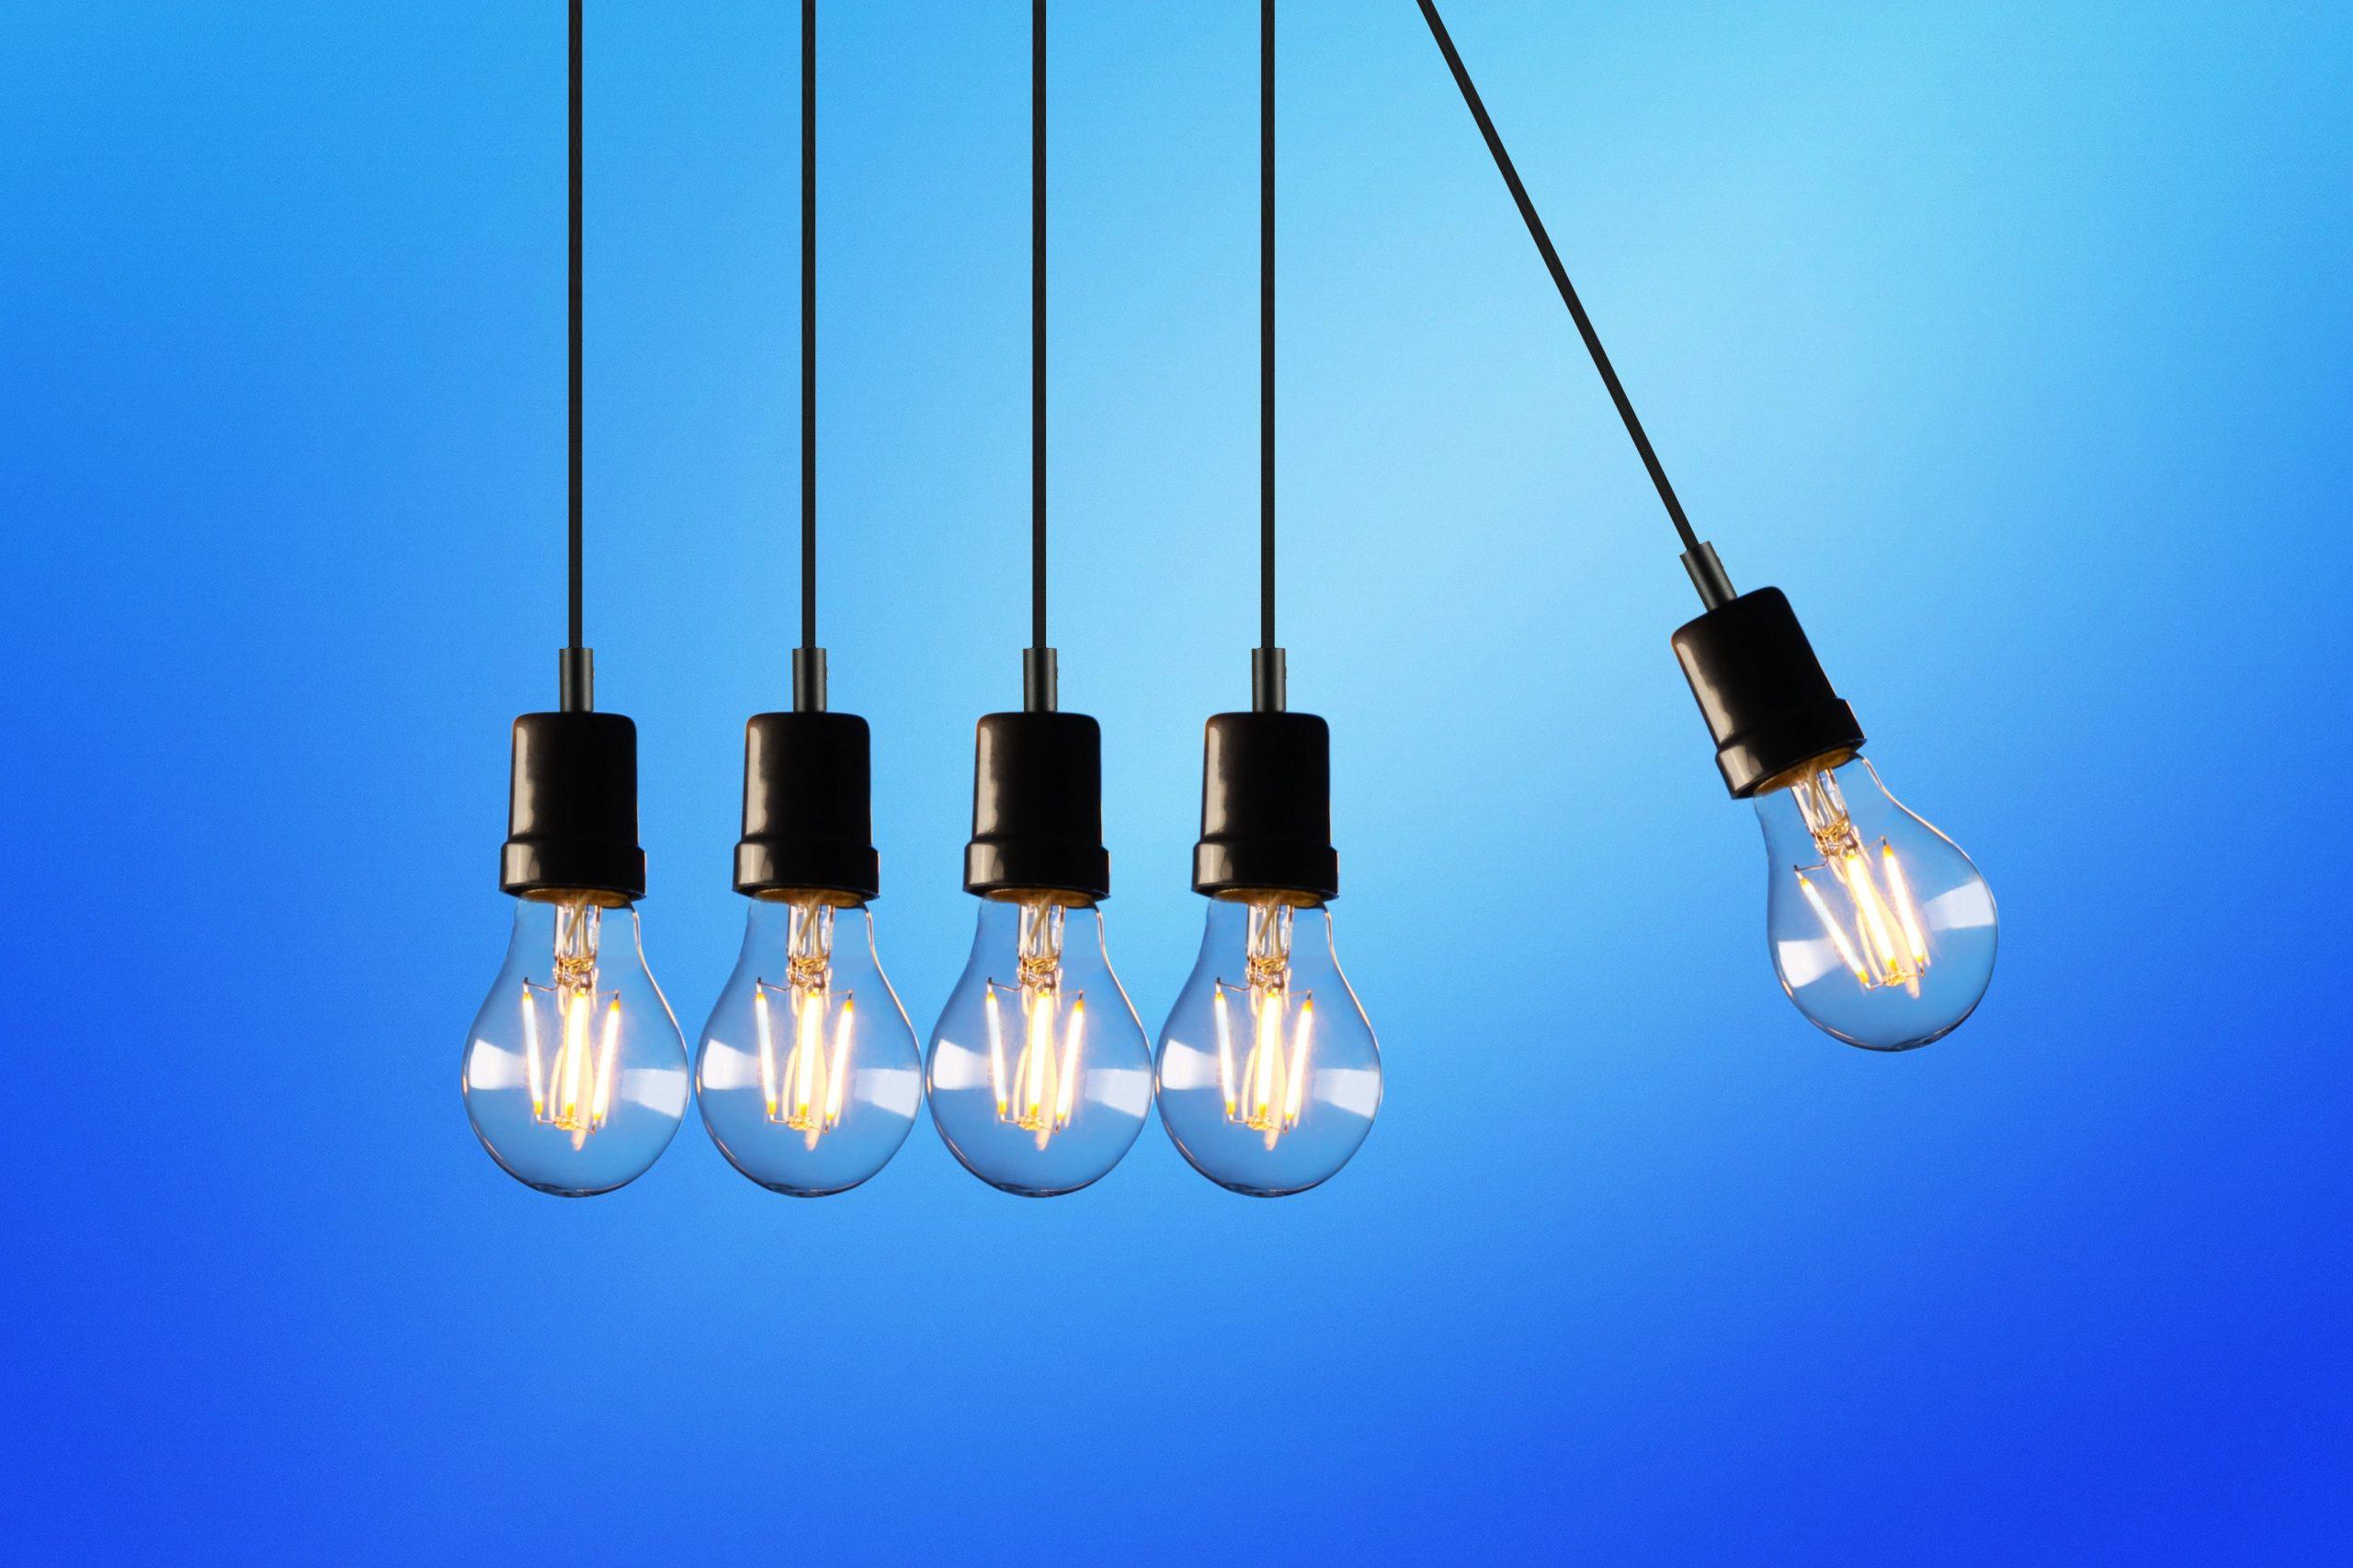 Five hanging lightbulbs